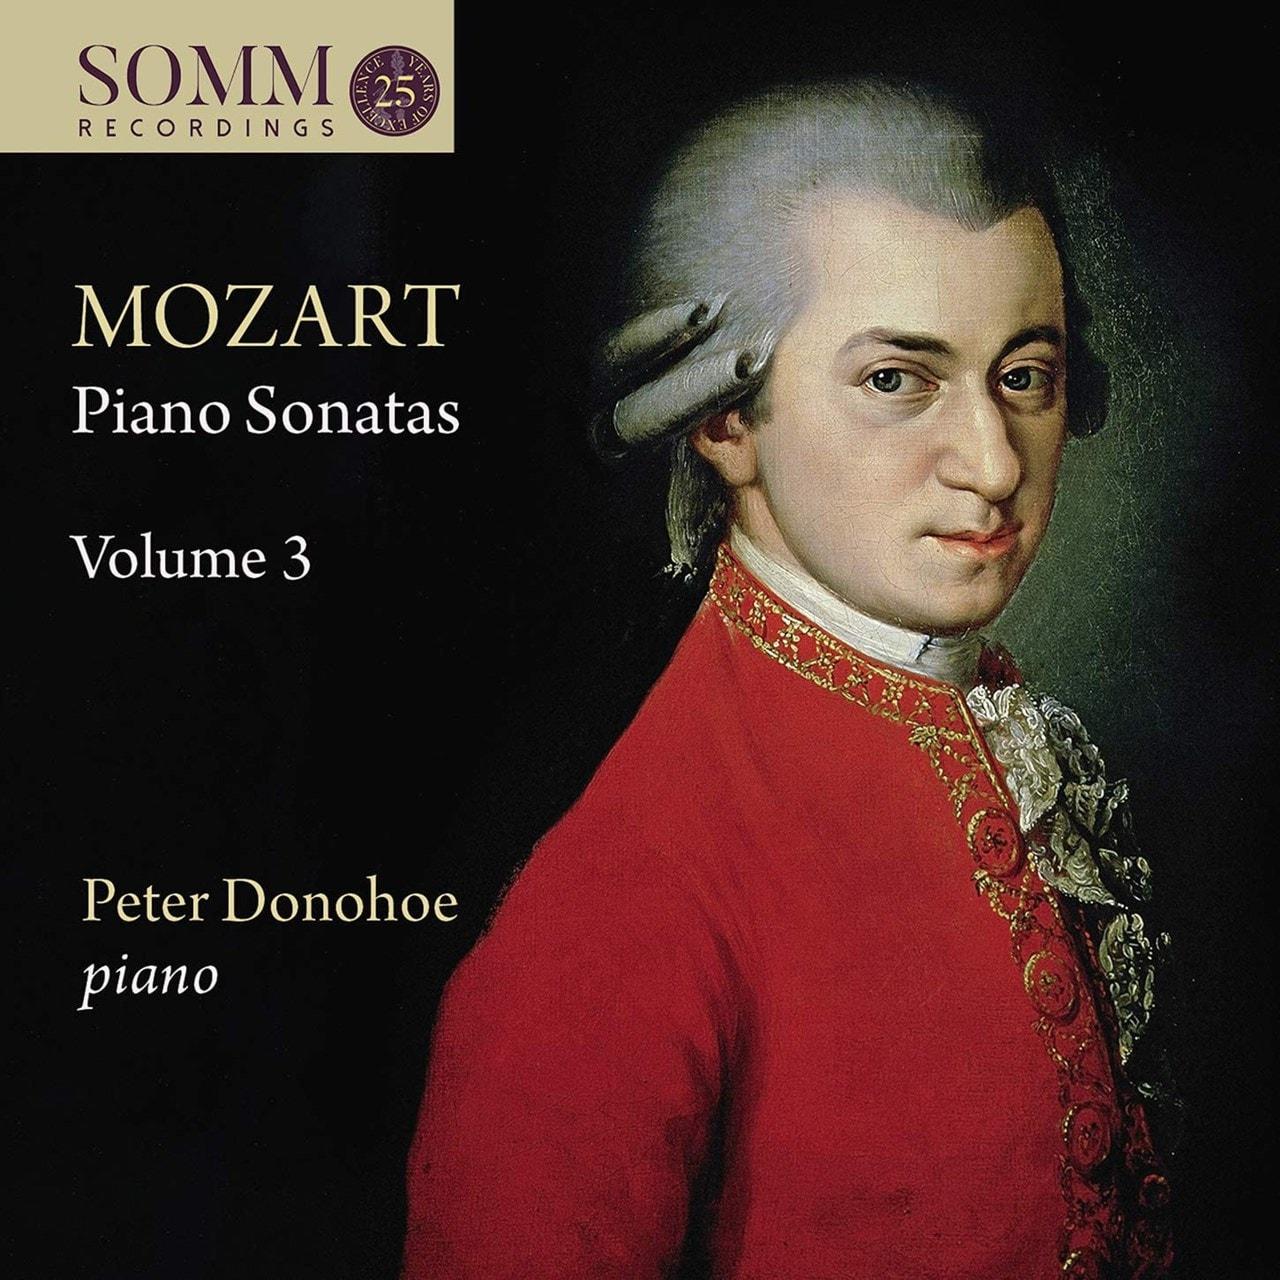 Mozart: Piano Sonatas - Volume 3 - 1